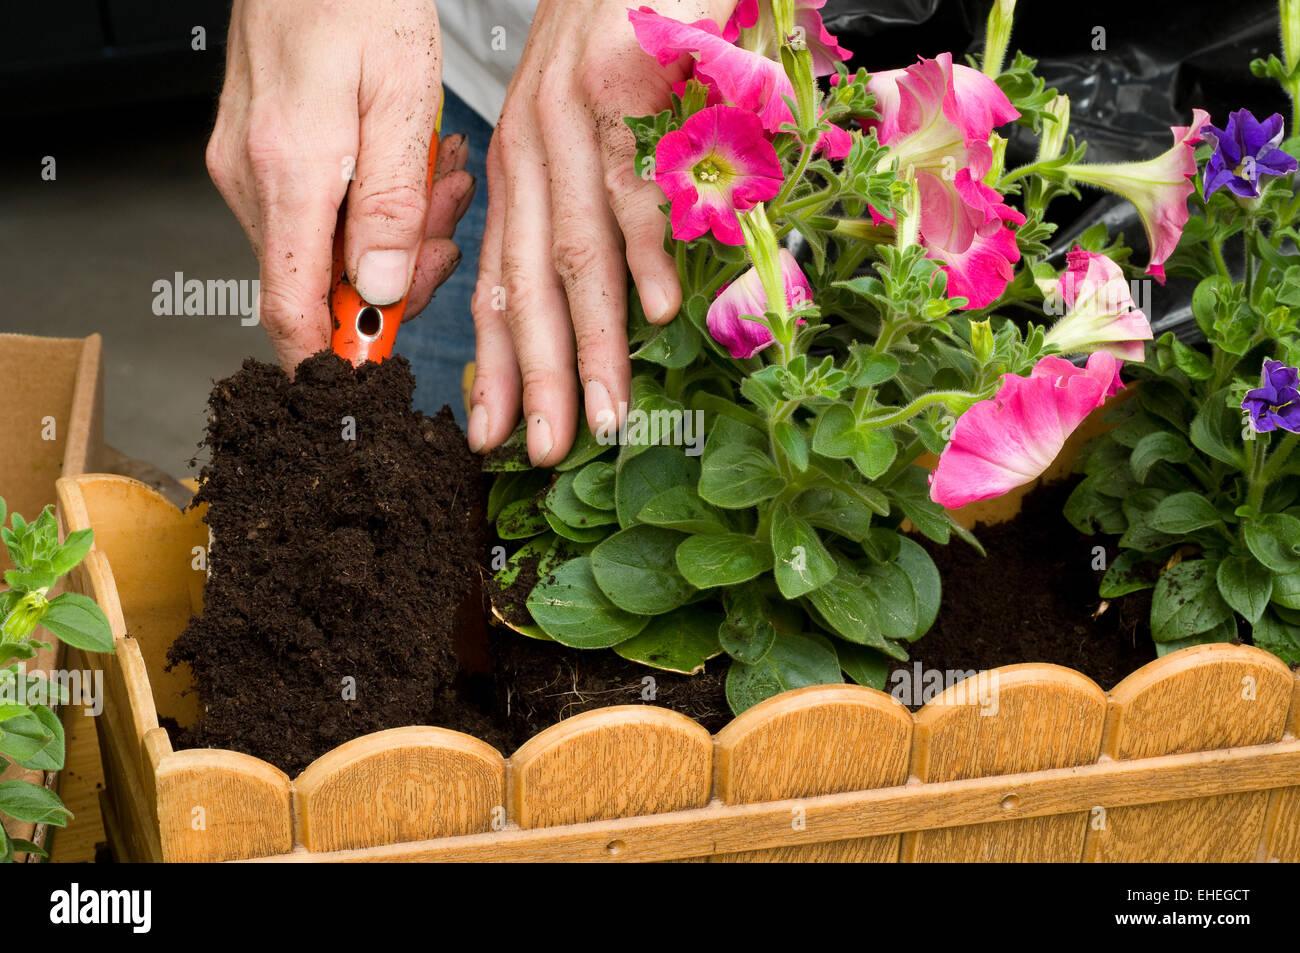 Balkonbepflanzung Planting Petunias Stock Photo 79610856 Alamy